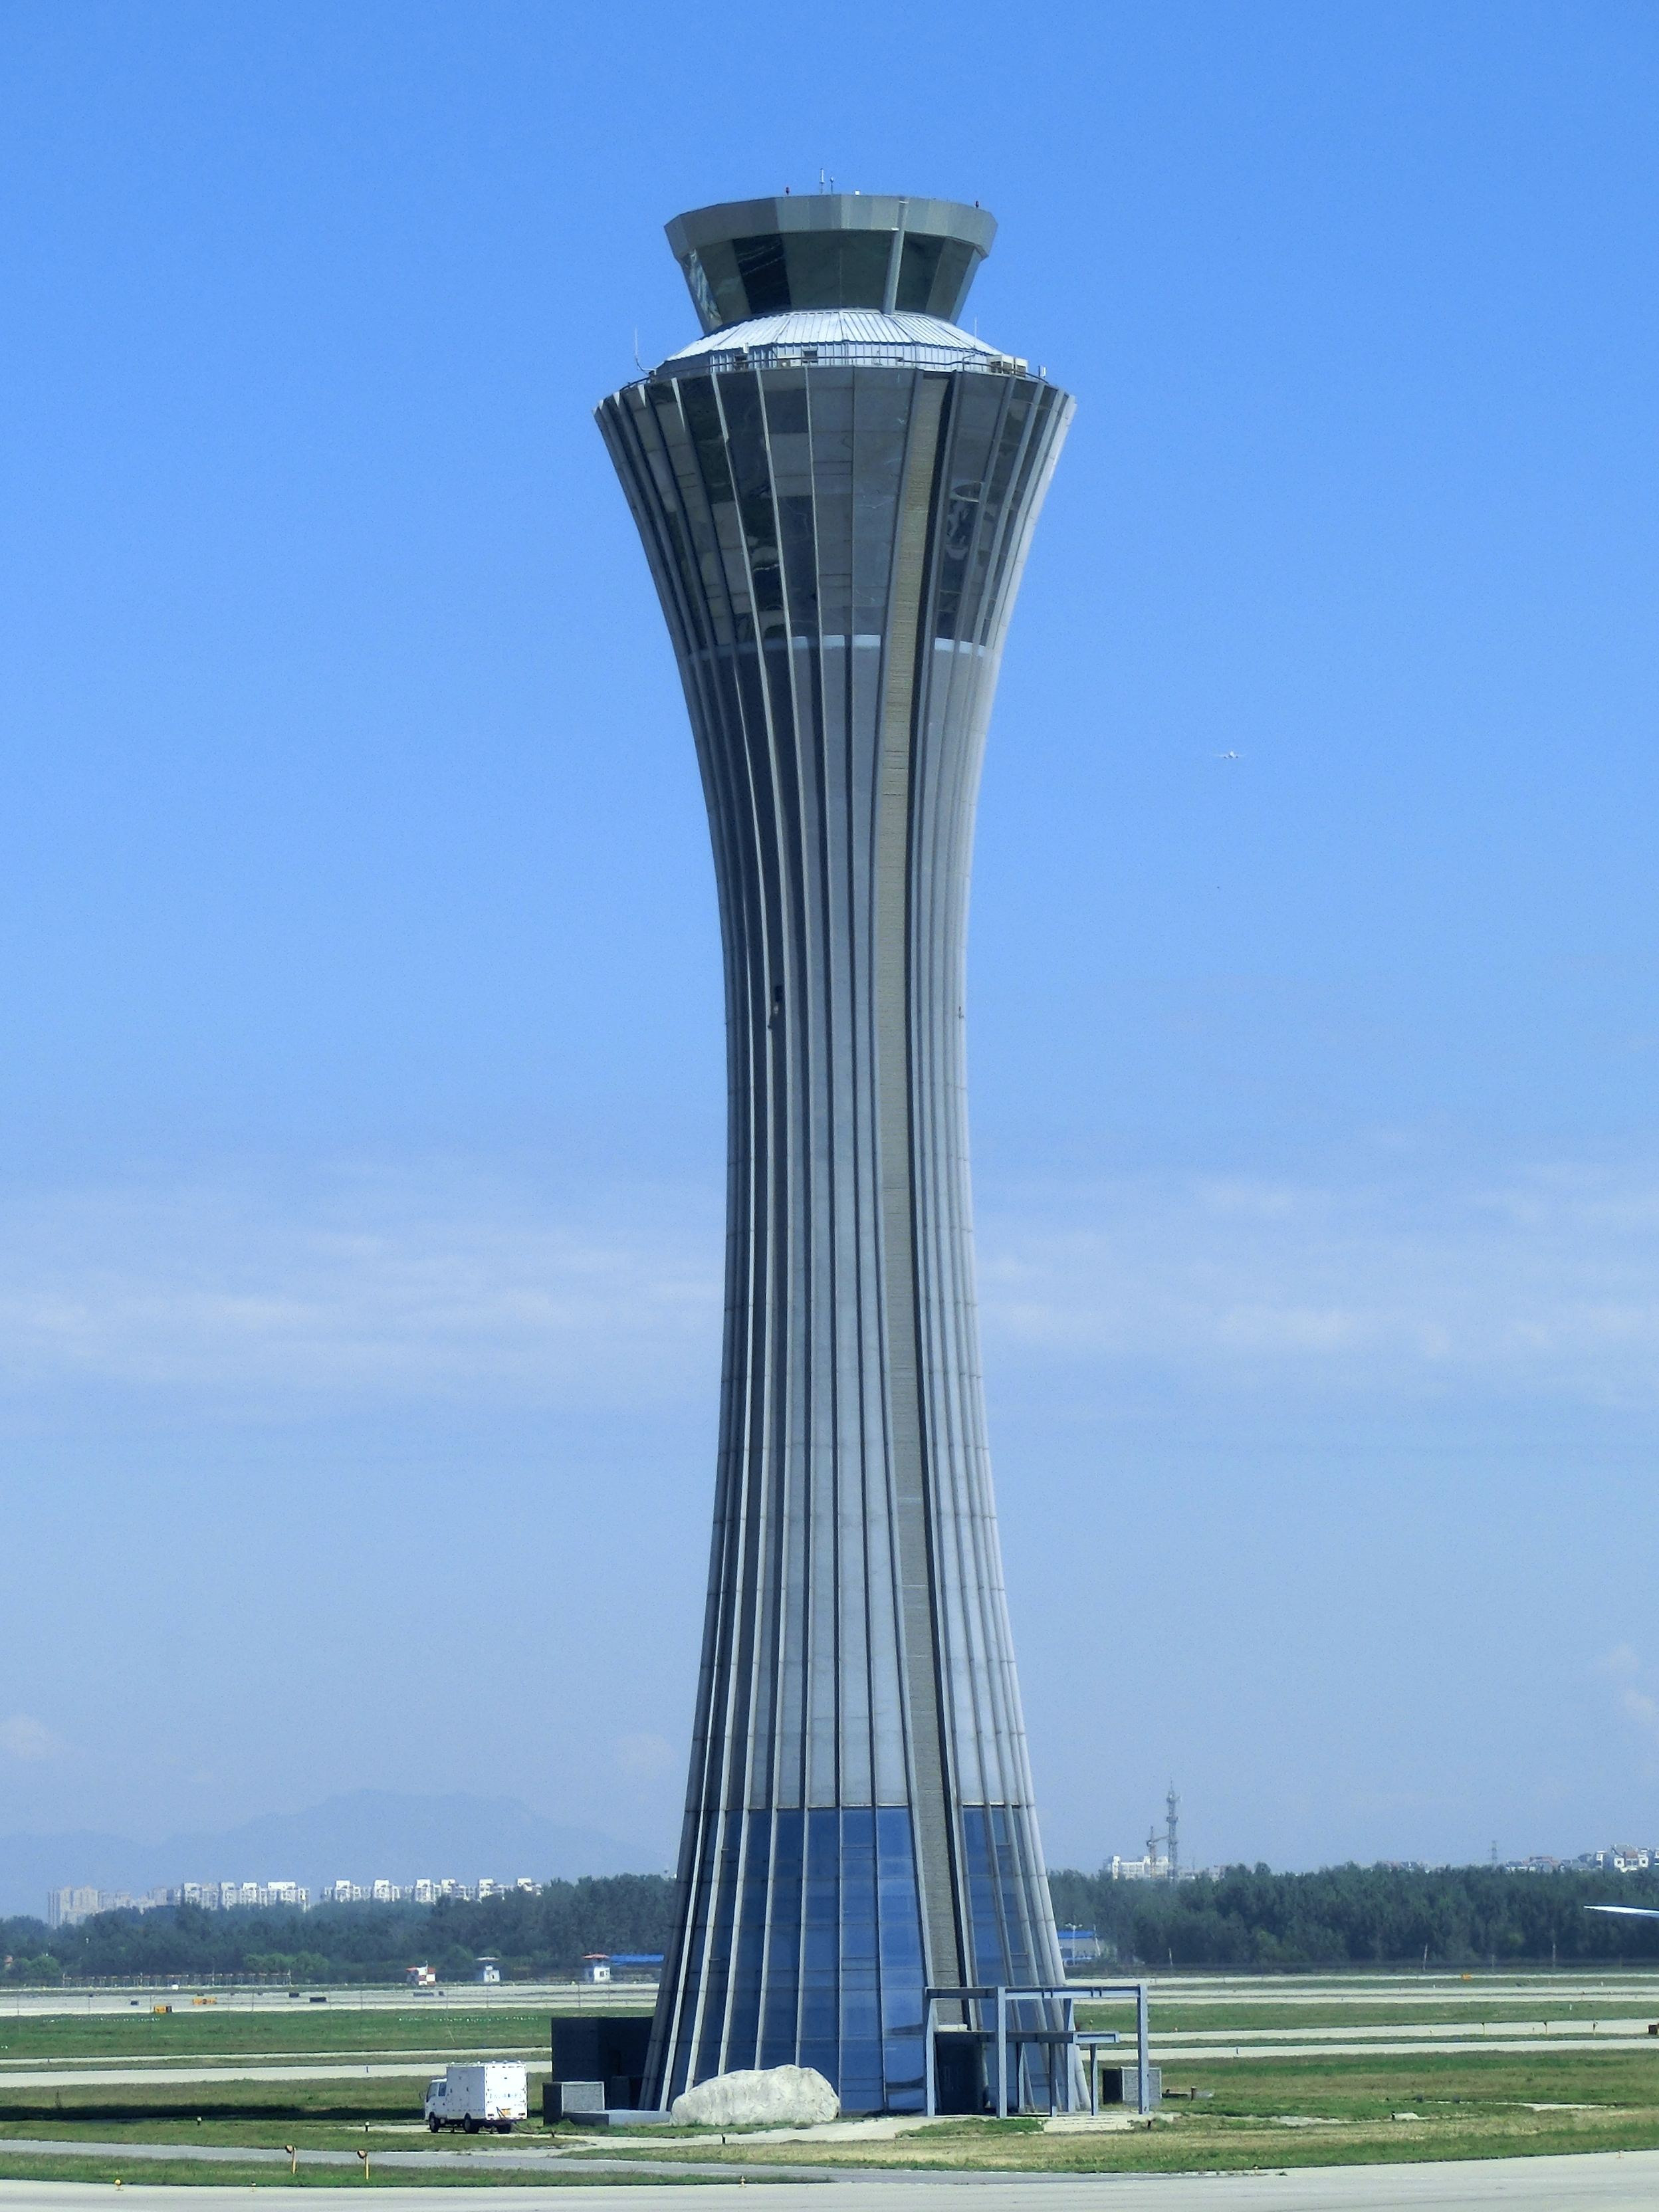 File:Beijing Capital International Airport BCIA Control Tower.jpg ...